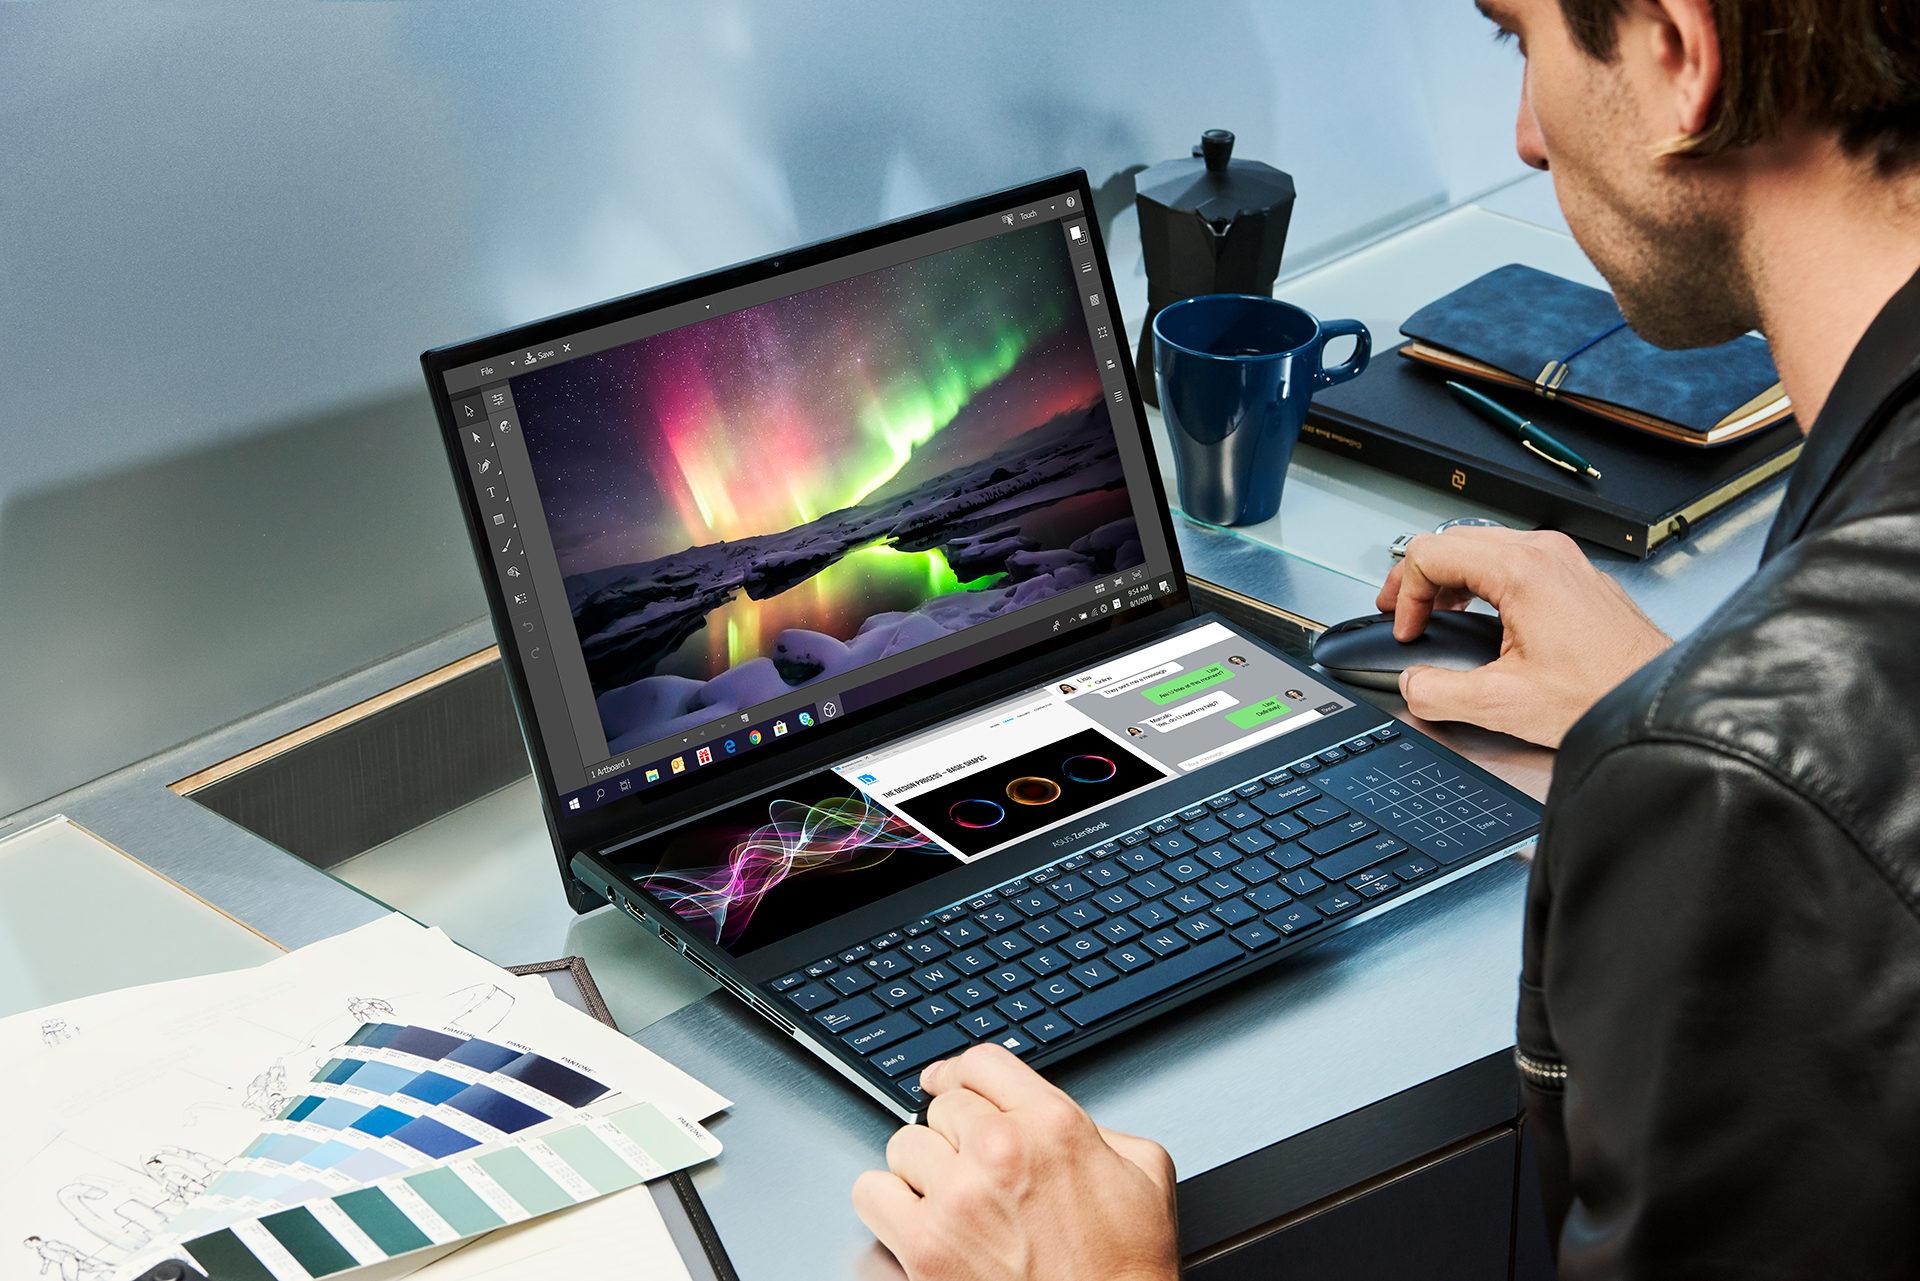 Goondu review: Asus ZenBook Pro Duo UX581 promises easier